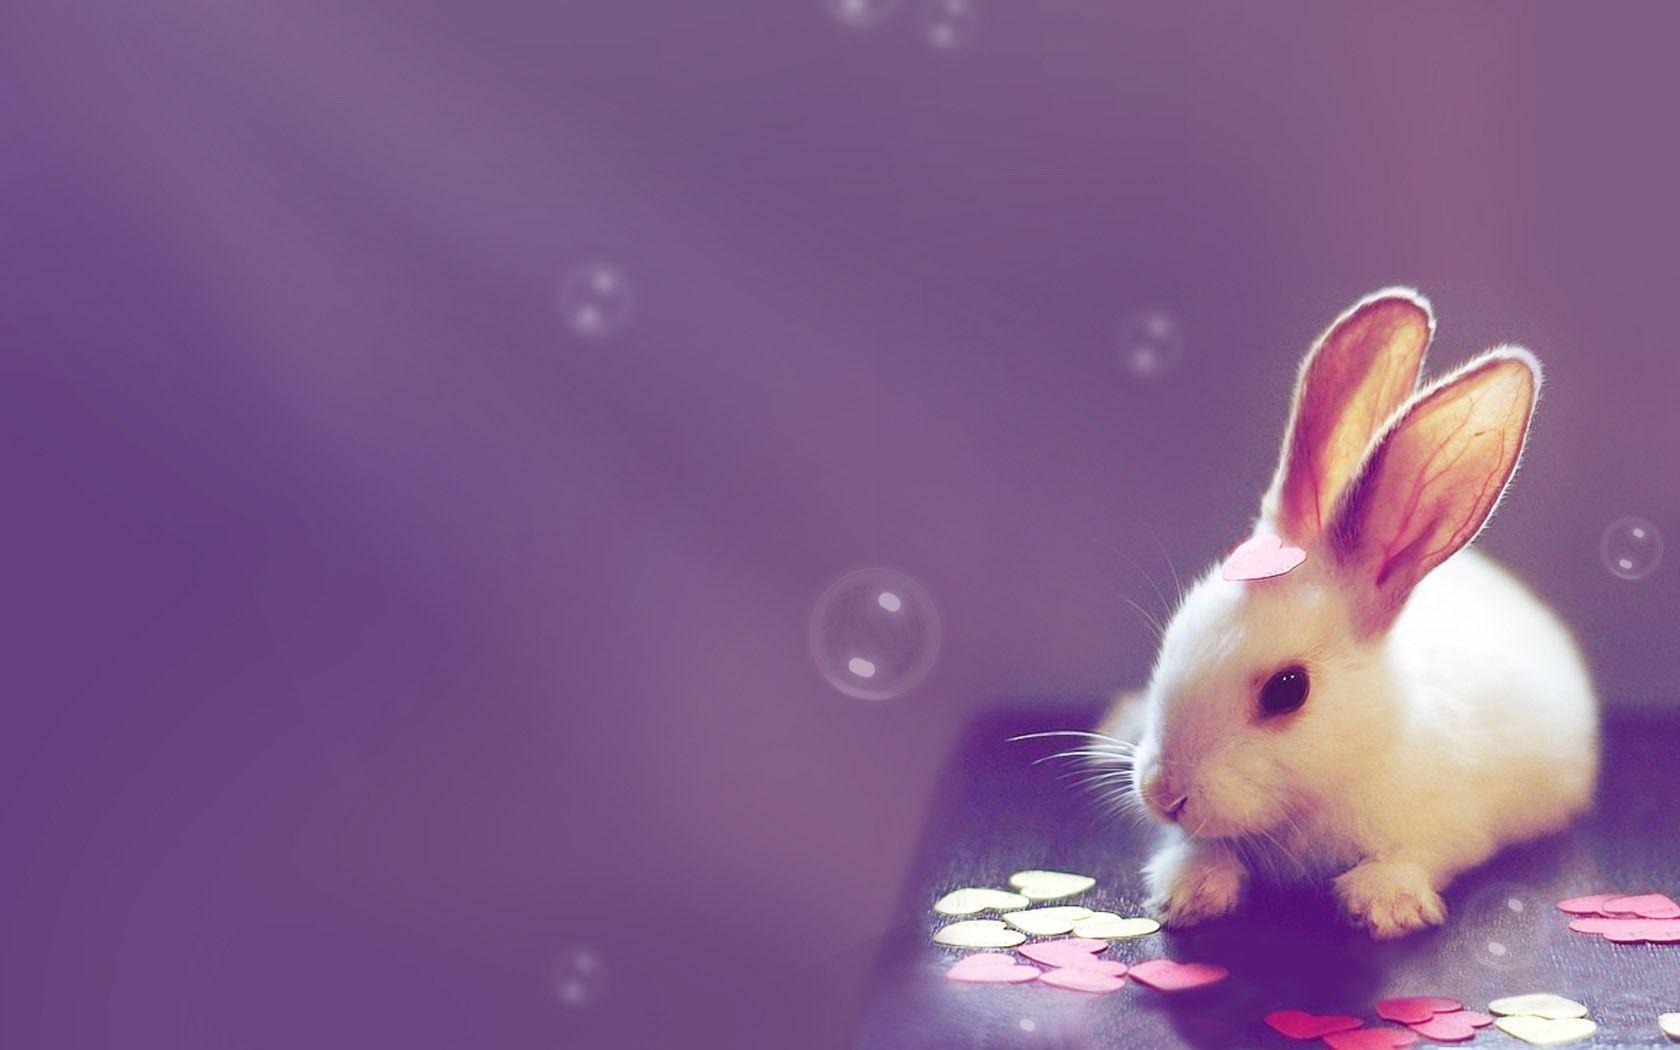 Cute Bunny Wallpapers Wallpaper Cave